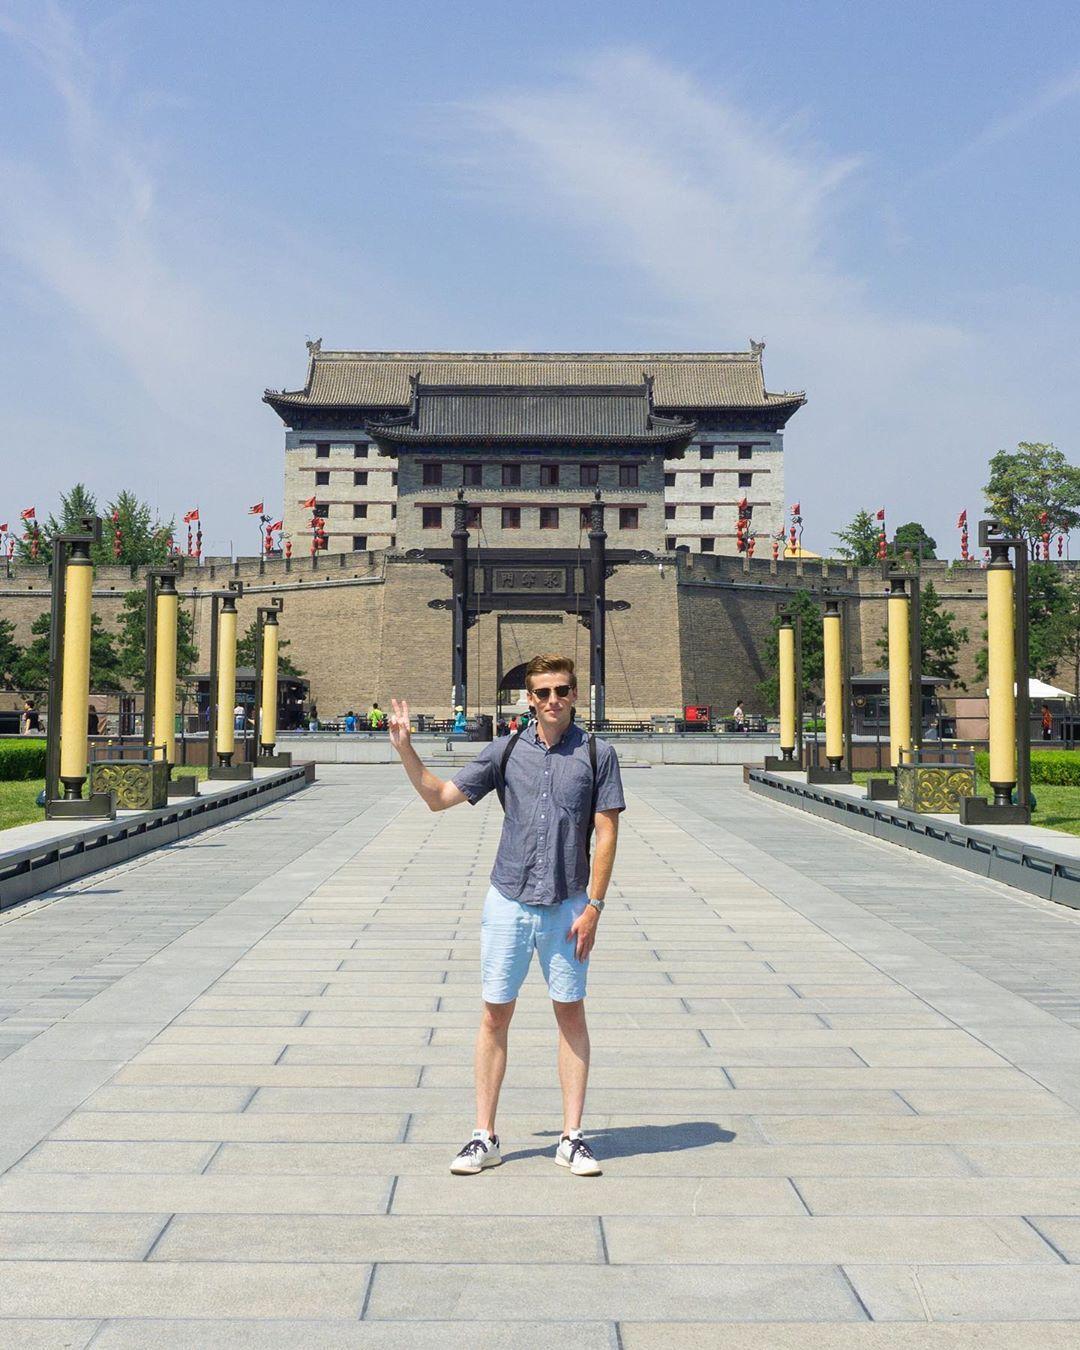 One of the ancient gates of Xi'an • • • • #travel #travelgram #china #china🇨🇳 #xian #instatravel #igtravel #instamood #summer #castle #citylife #city #photooftheday #photography #fbf #adventure #sony #sonyalpha #sonya6000 #tbt #nofilter #中国 #西安 #旅行 #インスタ映え #写真 #ファインダー越しの私の世界 #写真好きな人と繋がりたい